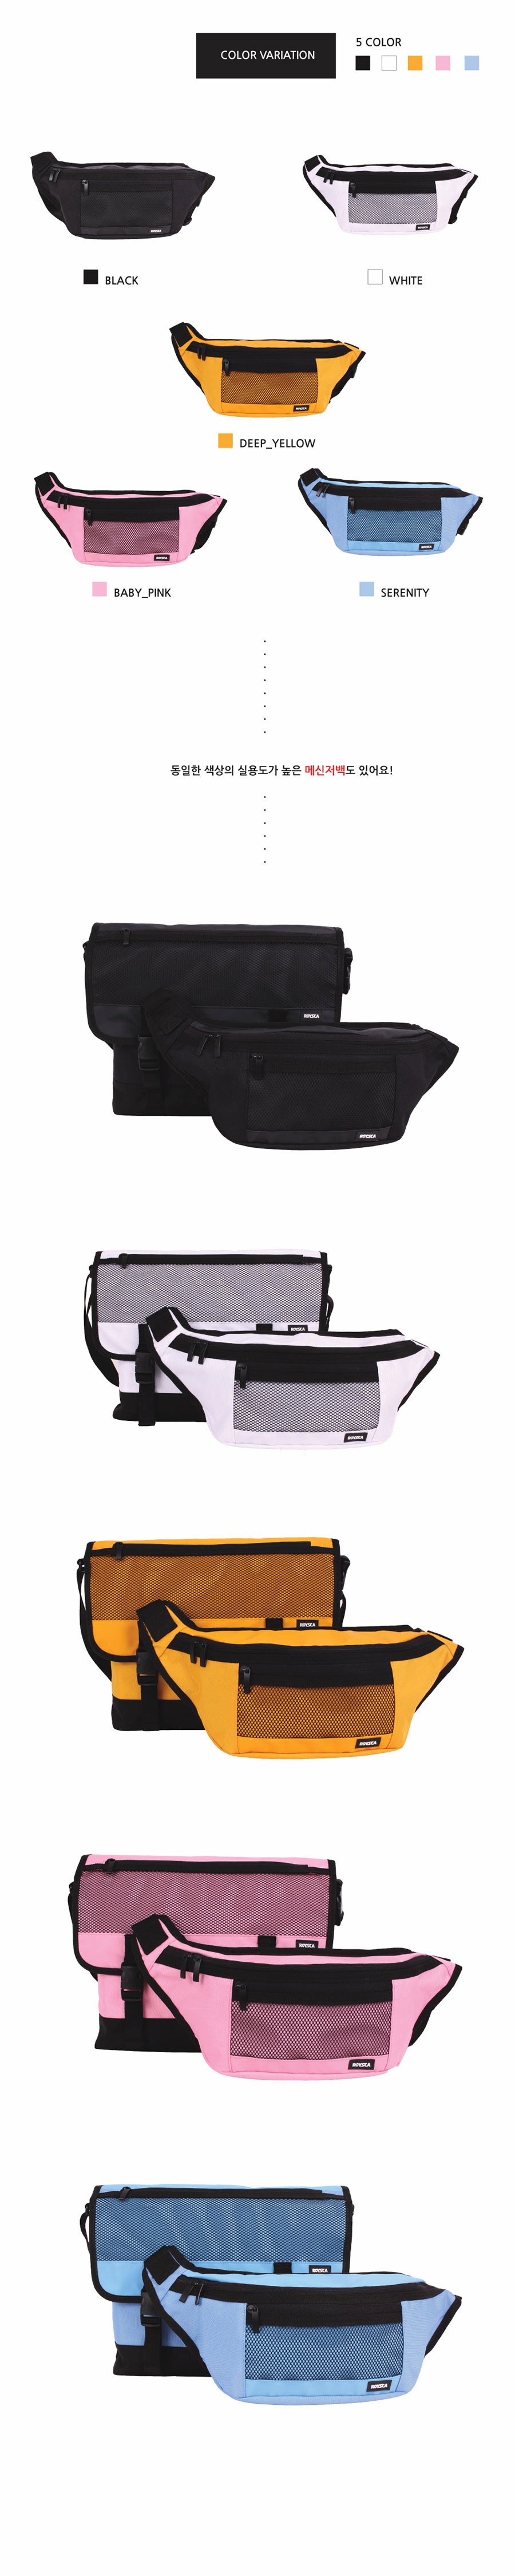 MASH WAIST BAG-DEEP YELLOW - 로이스카, 39,000원, 크로스백, 패브릭크로스백